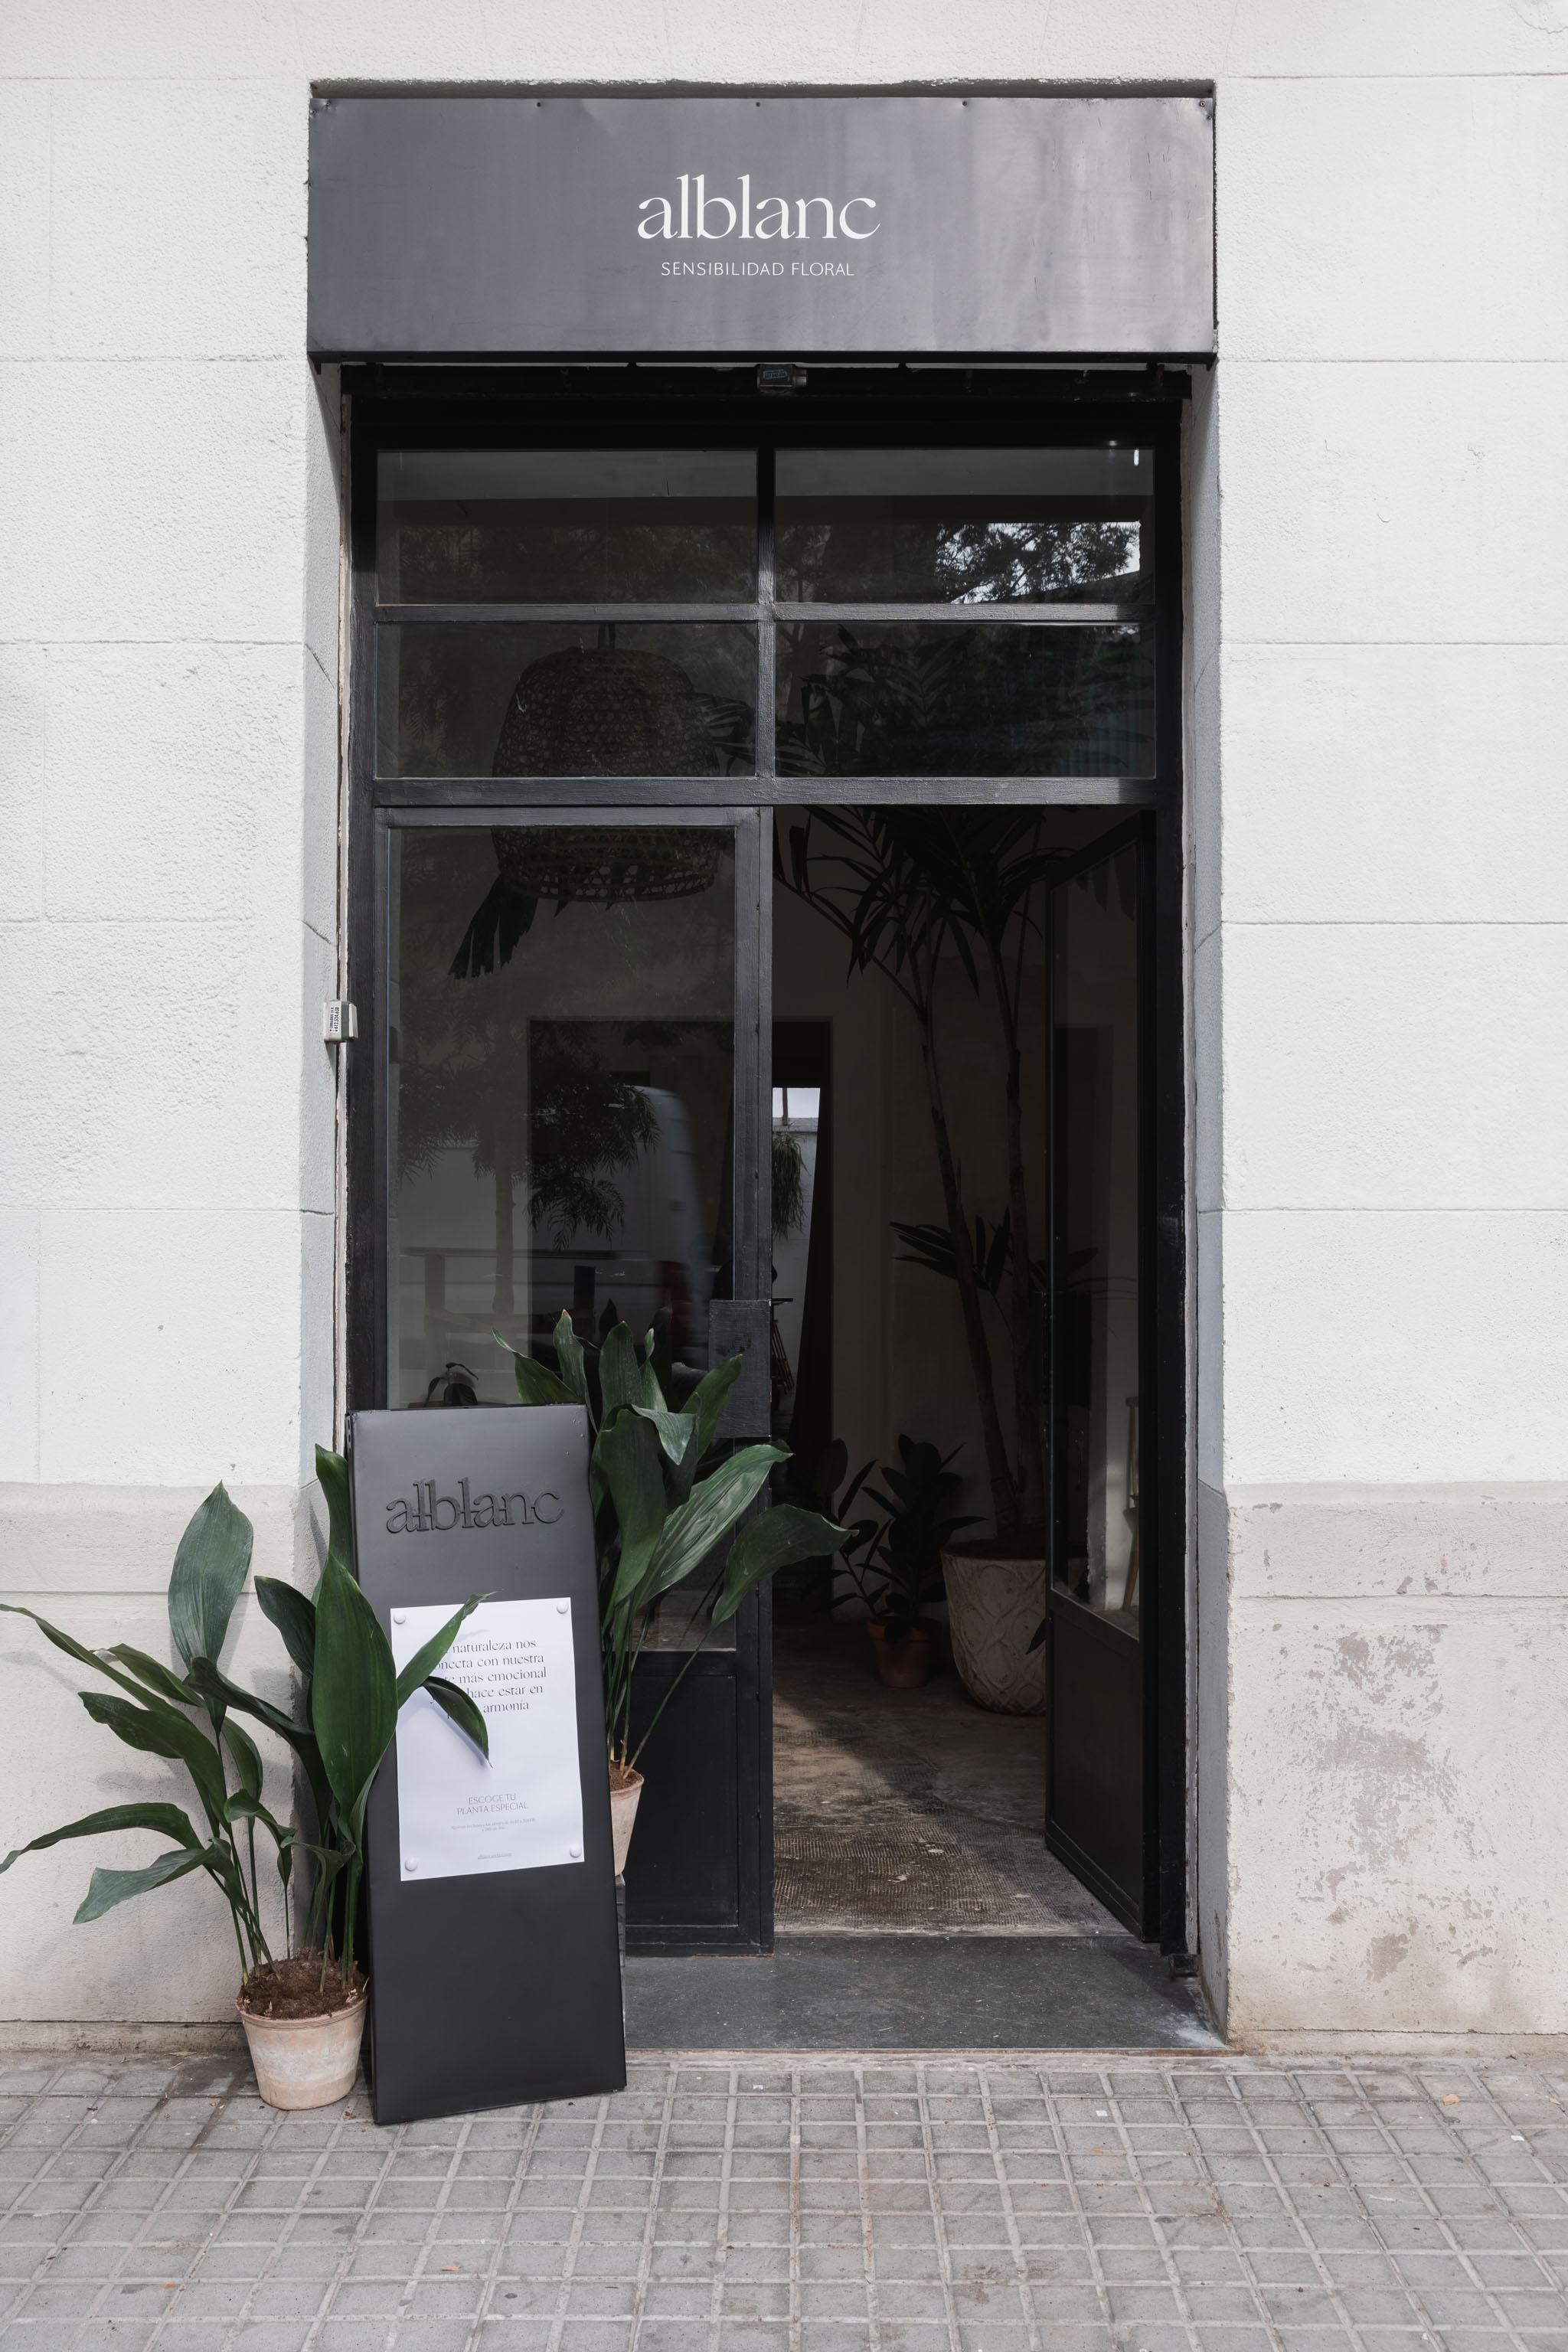 alblanc atelier floral poblenou 4.jpg